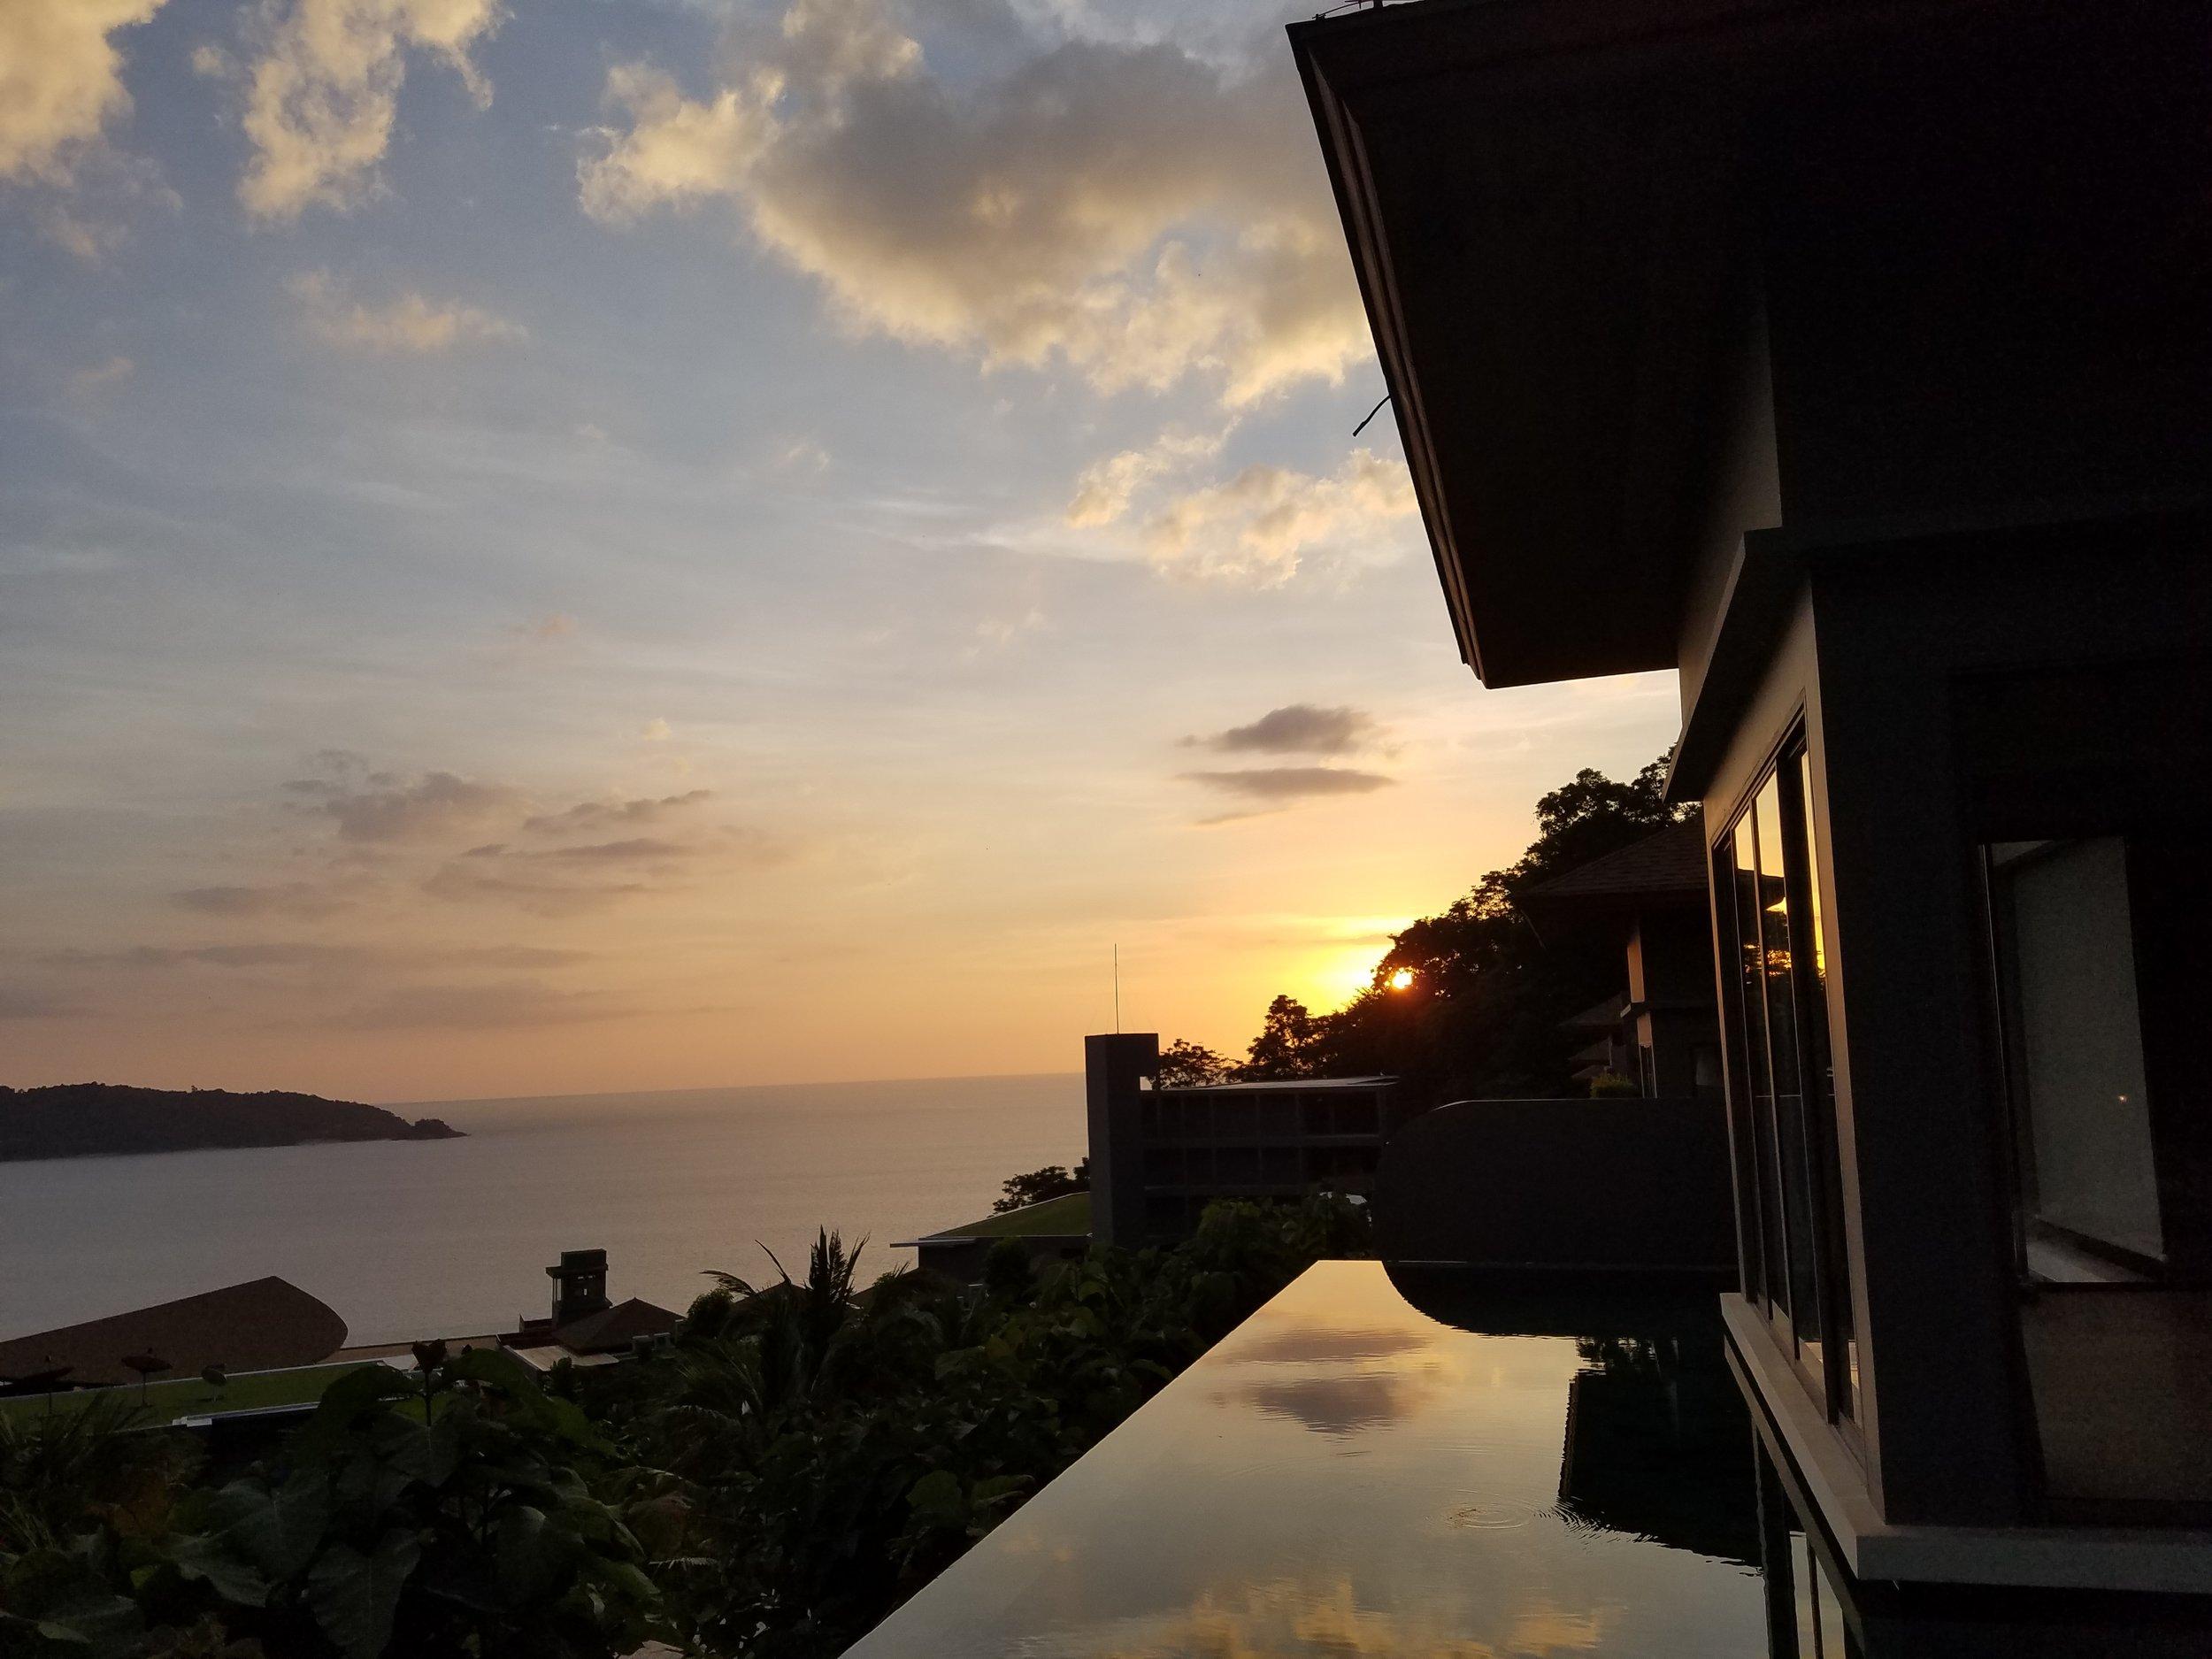 kalima sunset.jpg